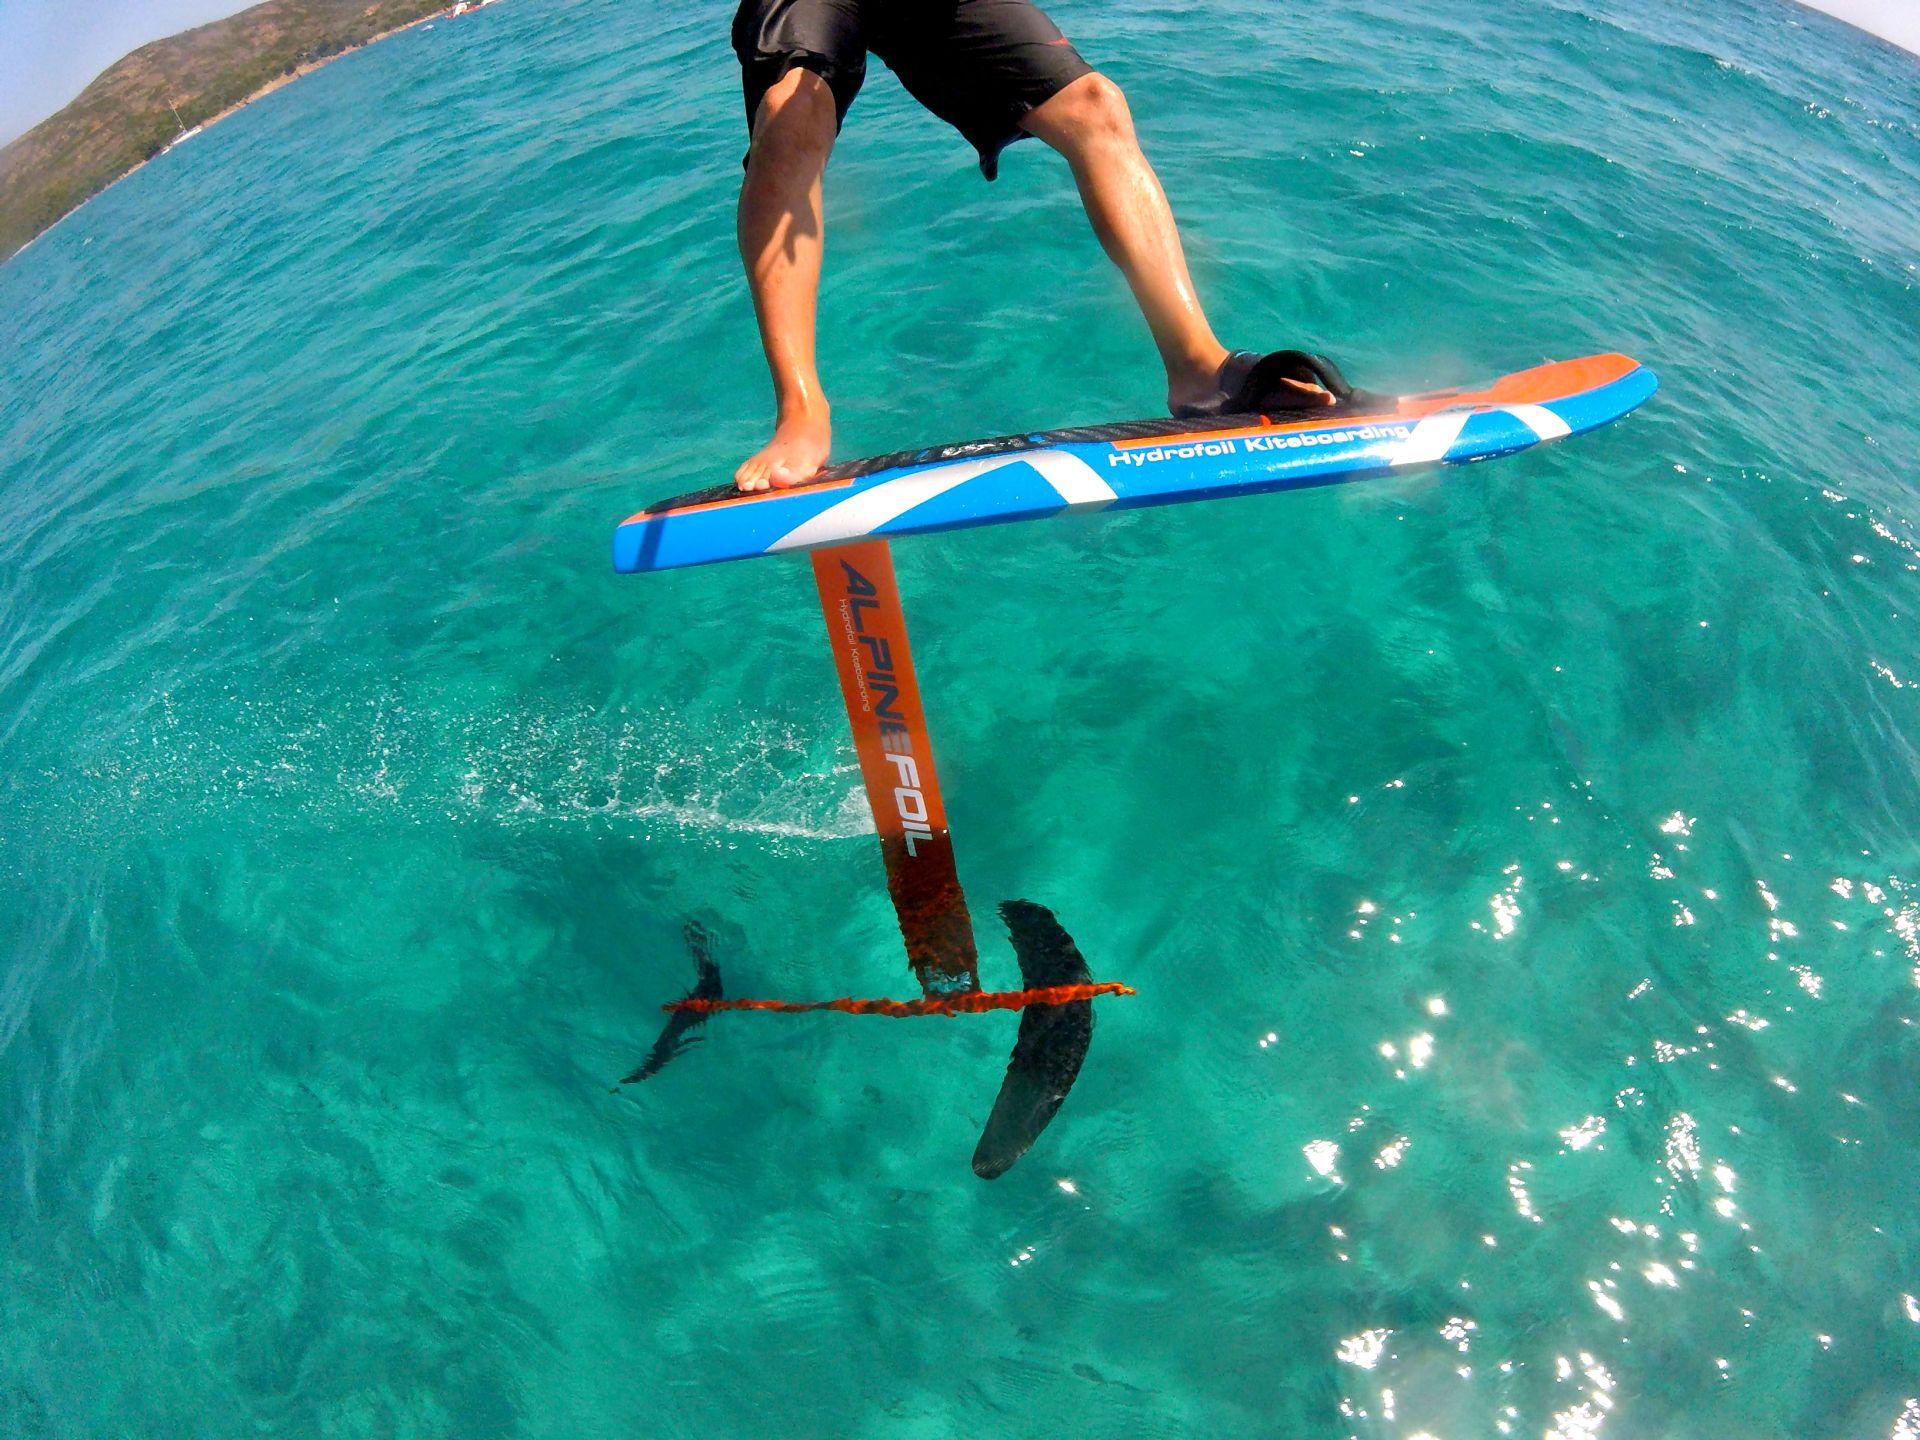 Kitefoil board alpinefoil rxv5s g0072277 1